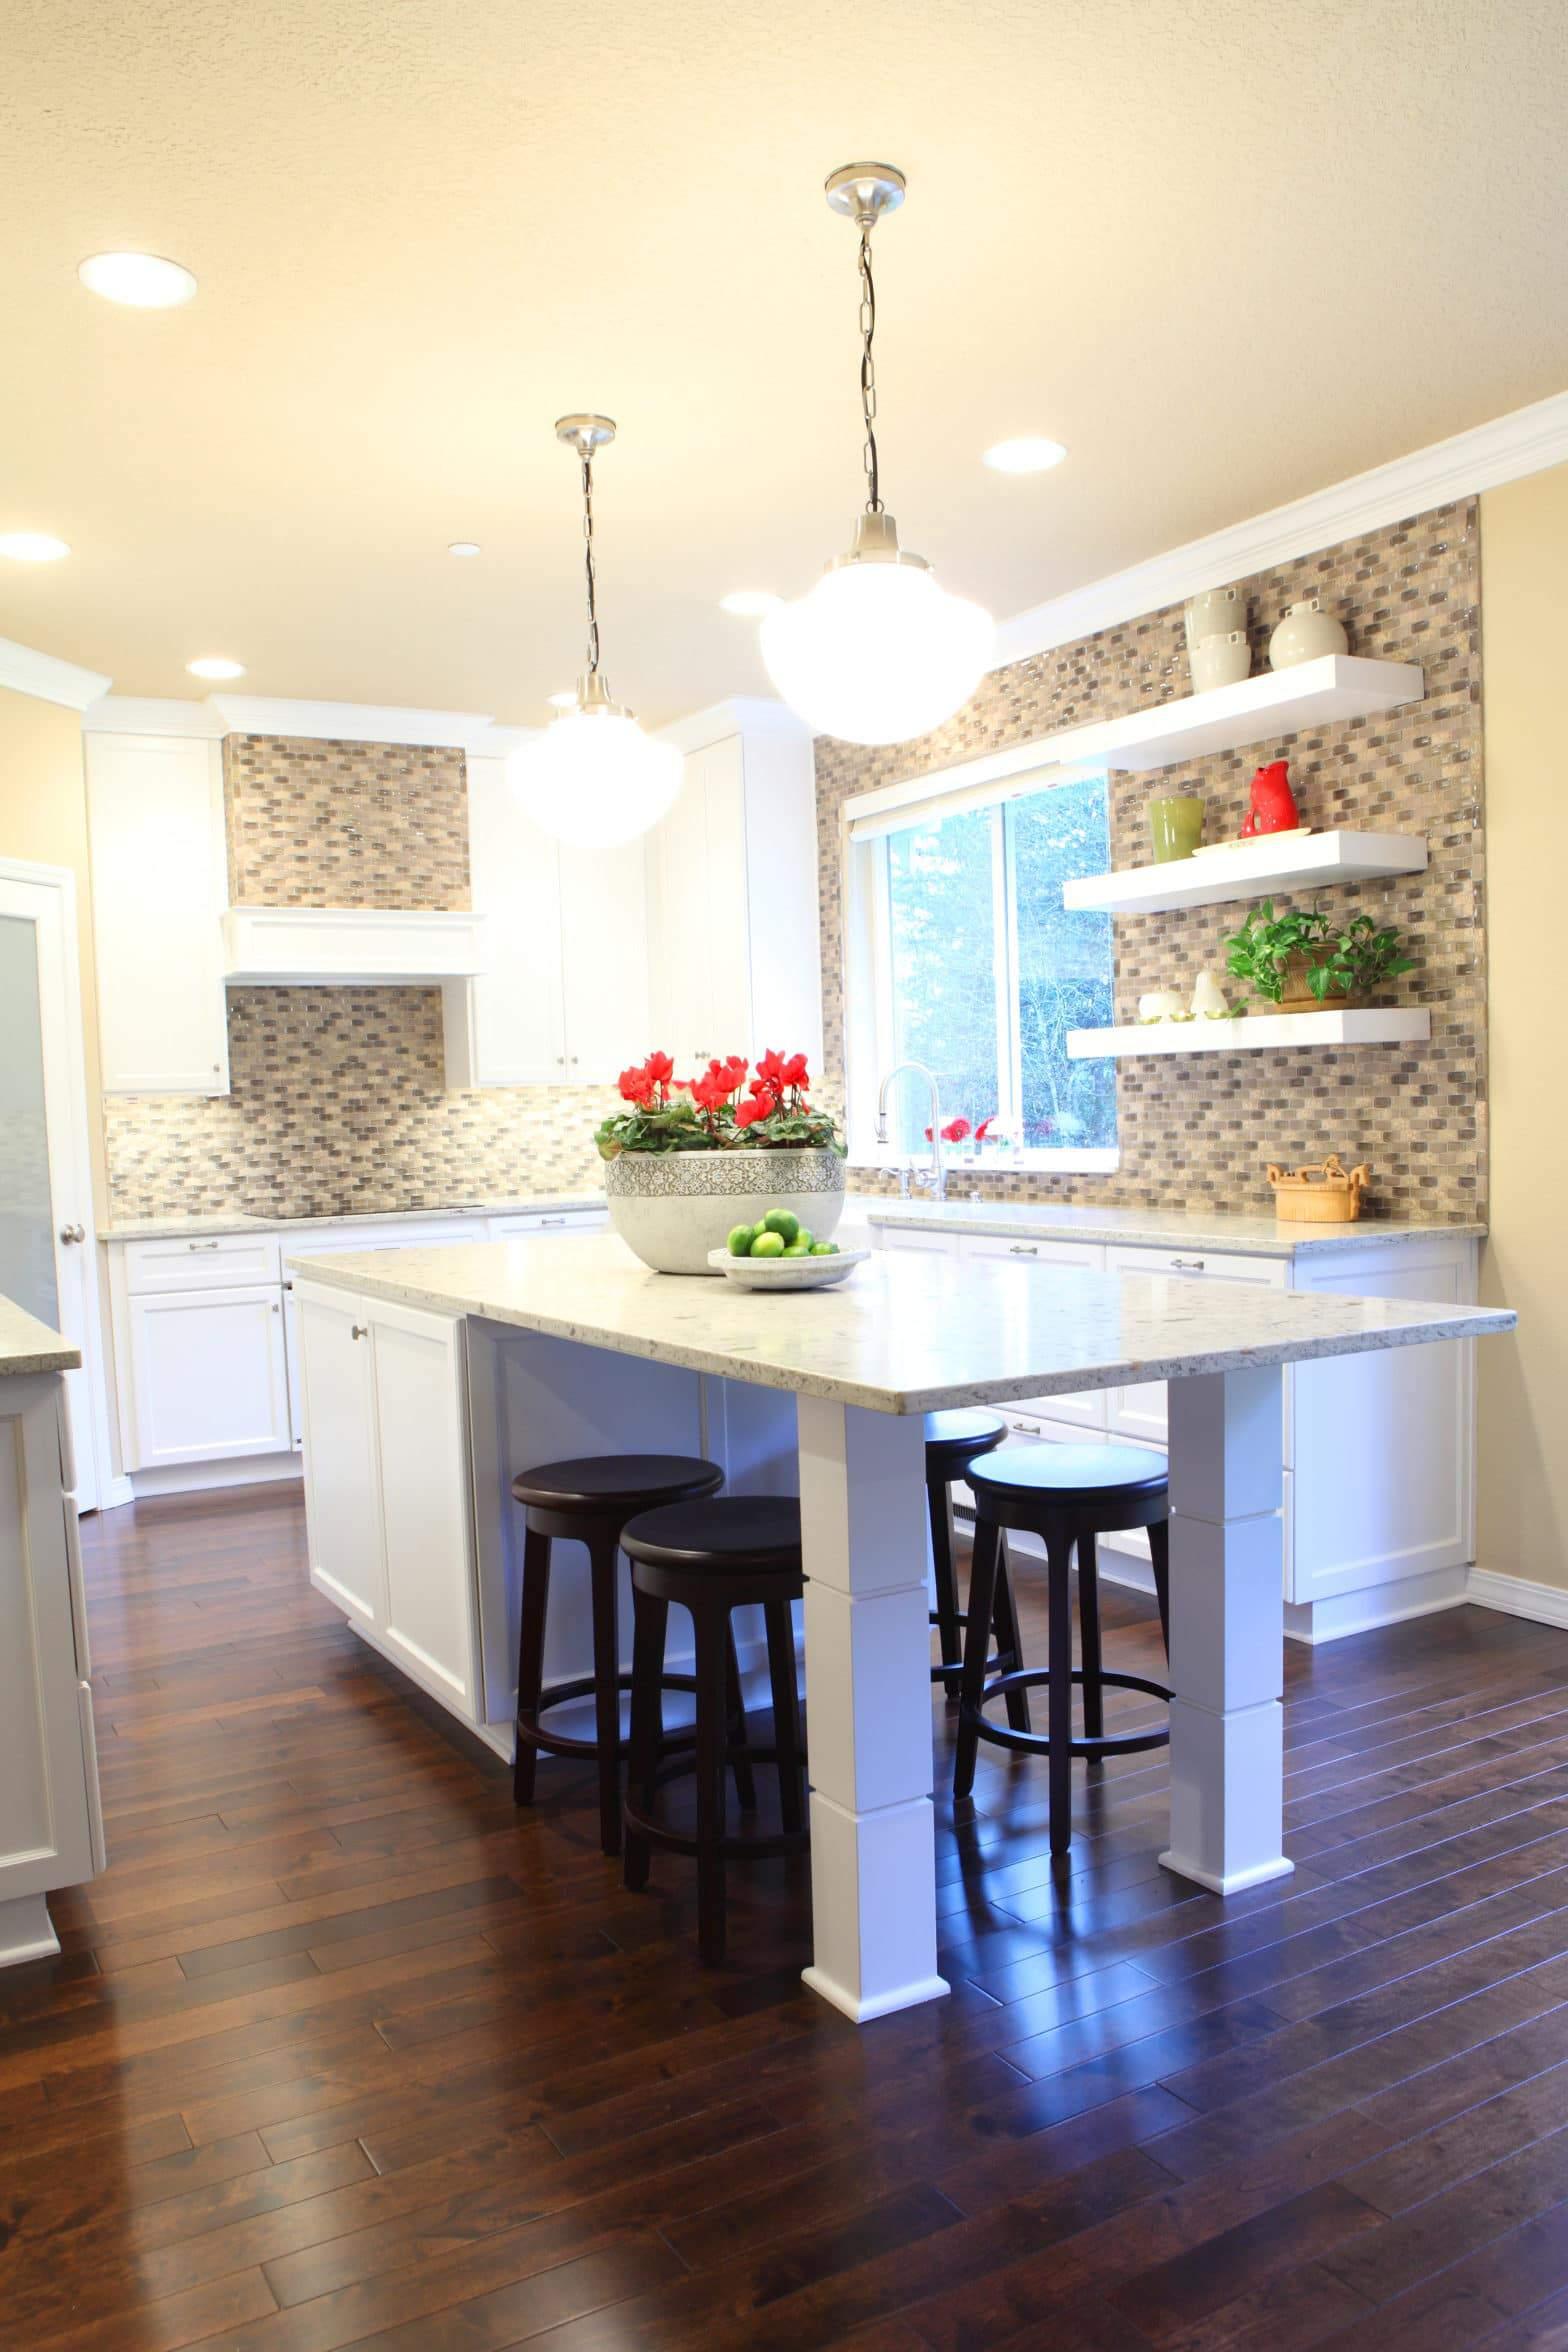 custom kitchen remodel with farm sink